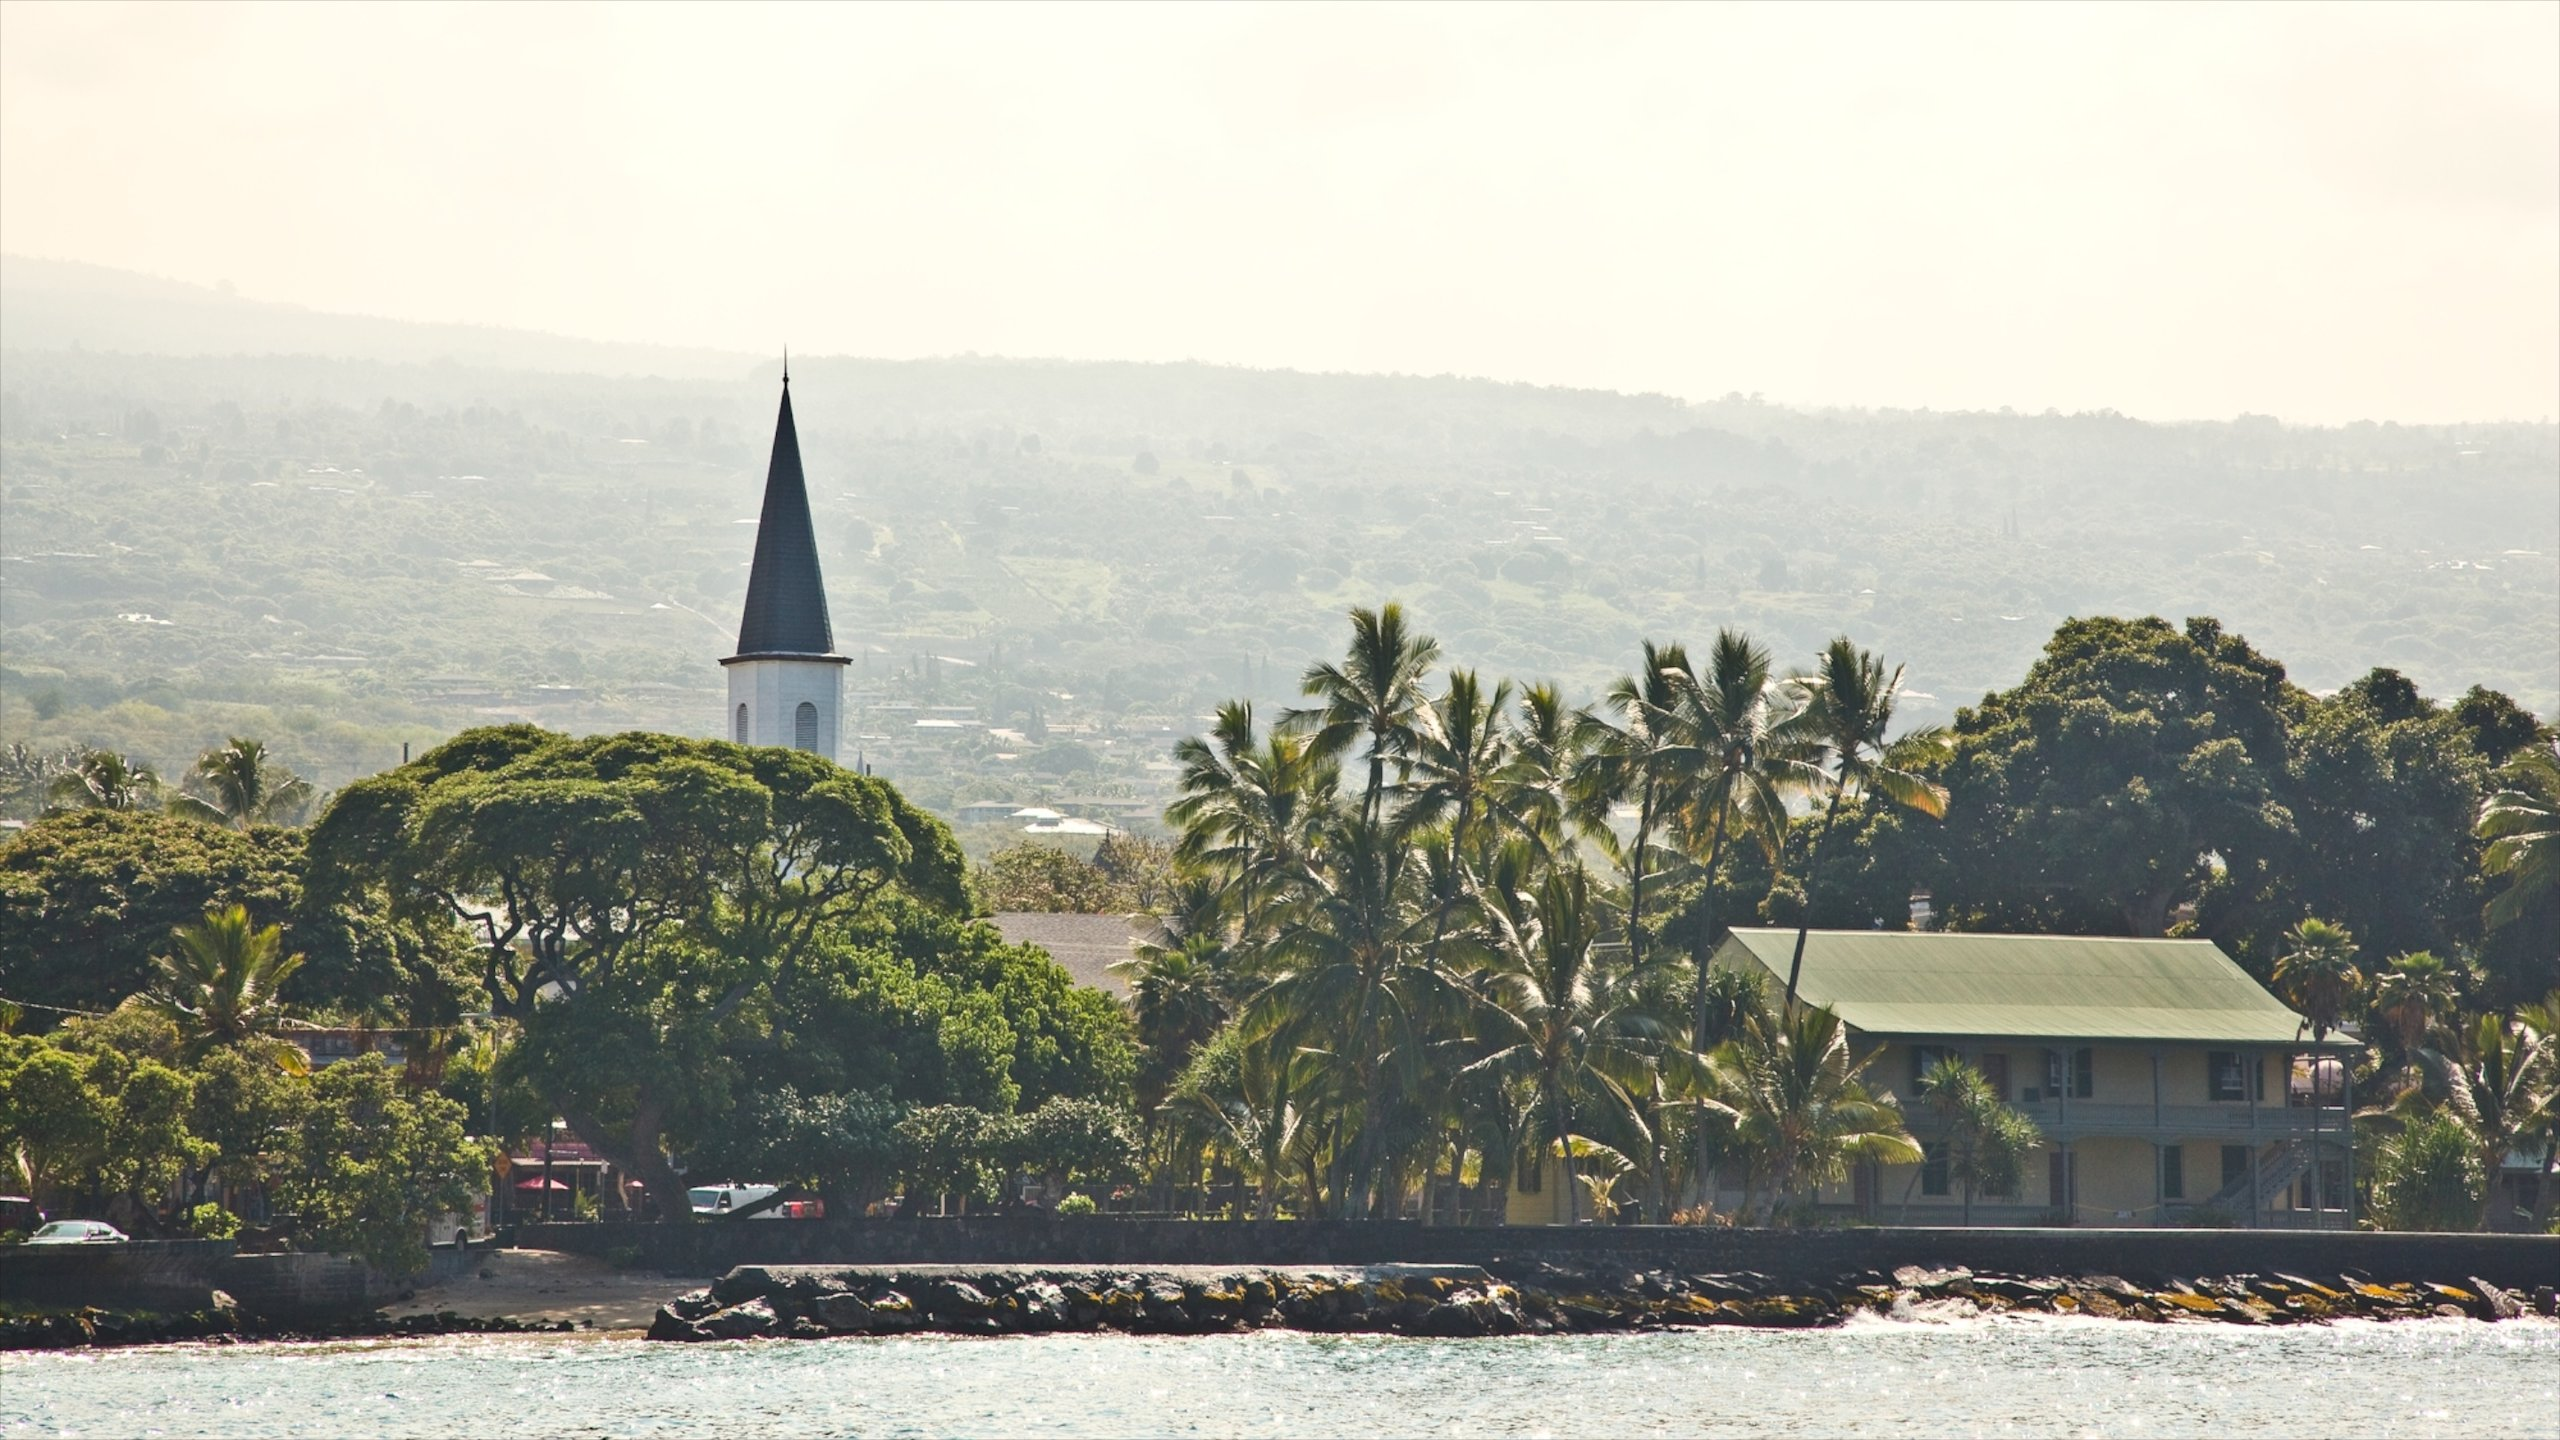 Historic Kailua Village, Kailua-Kona, Hawaii, United States of America